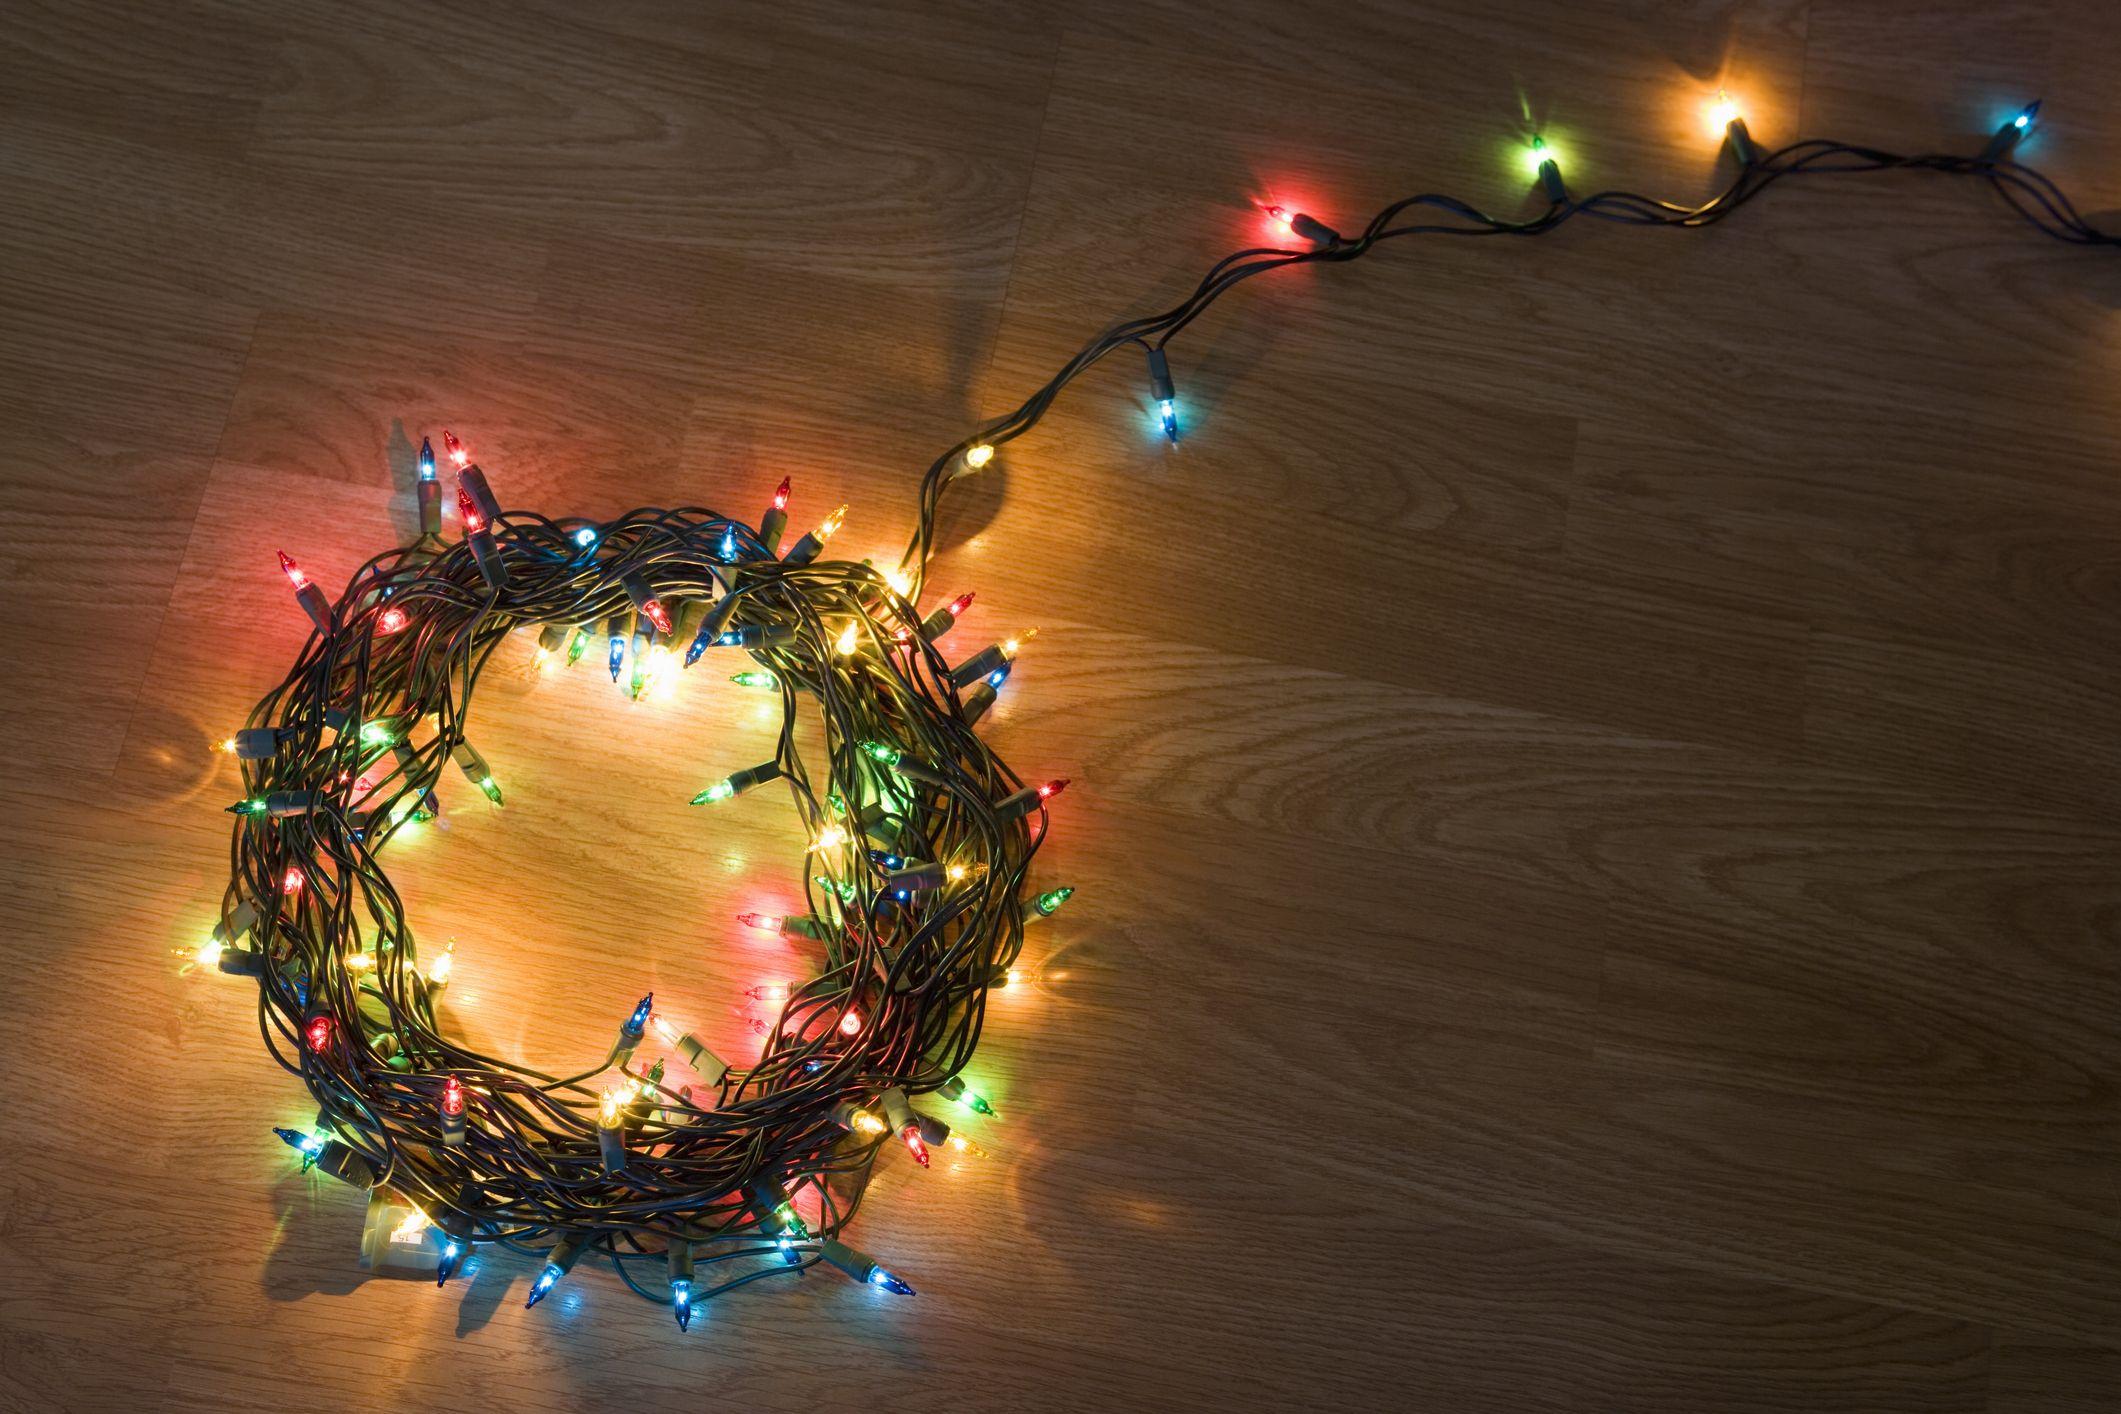 How To Hang Christmas Tree Lights Best Ways Mini Light Wiring Diagram